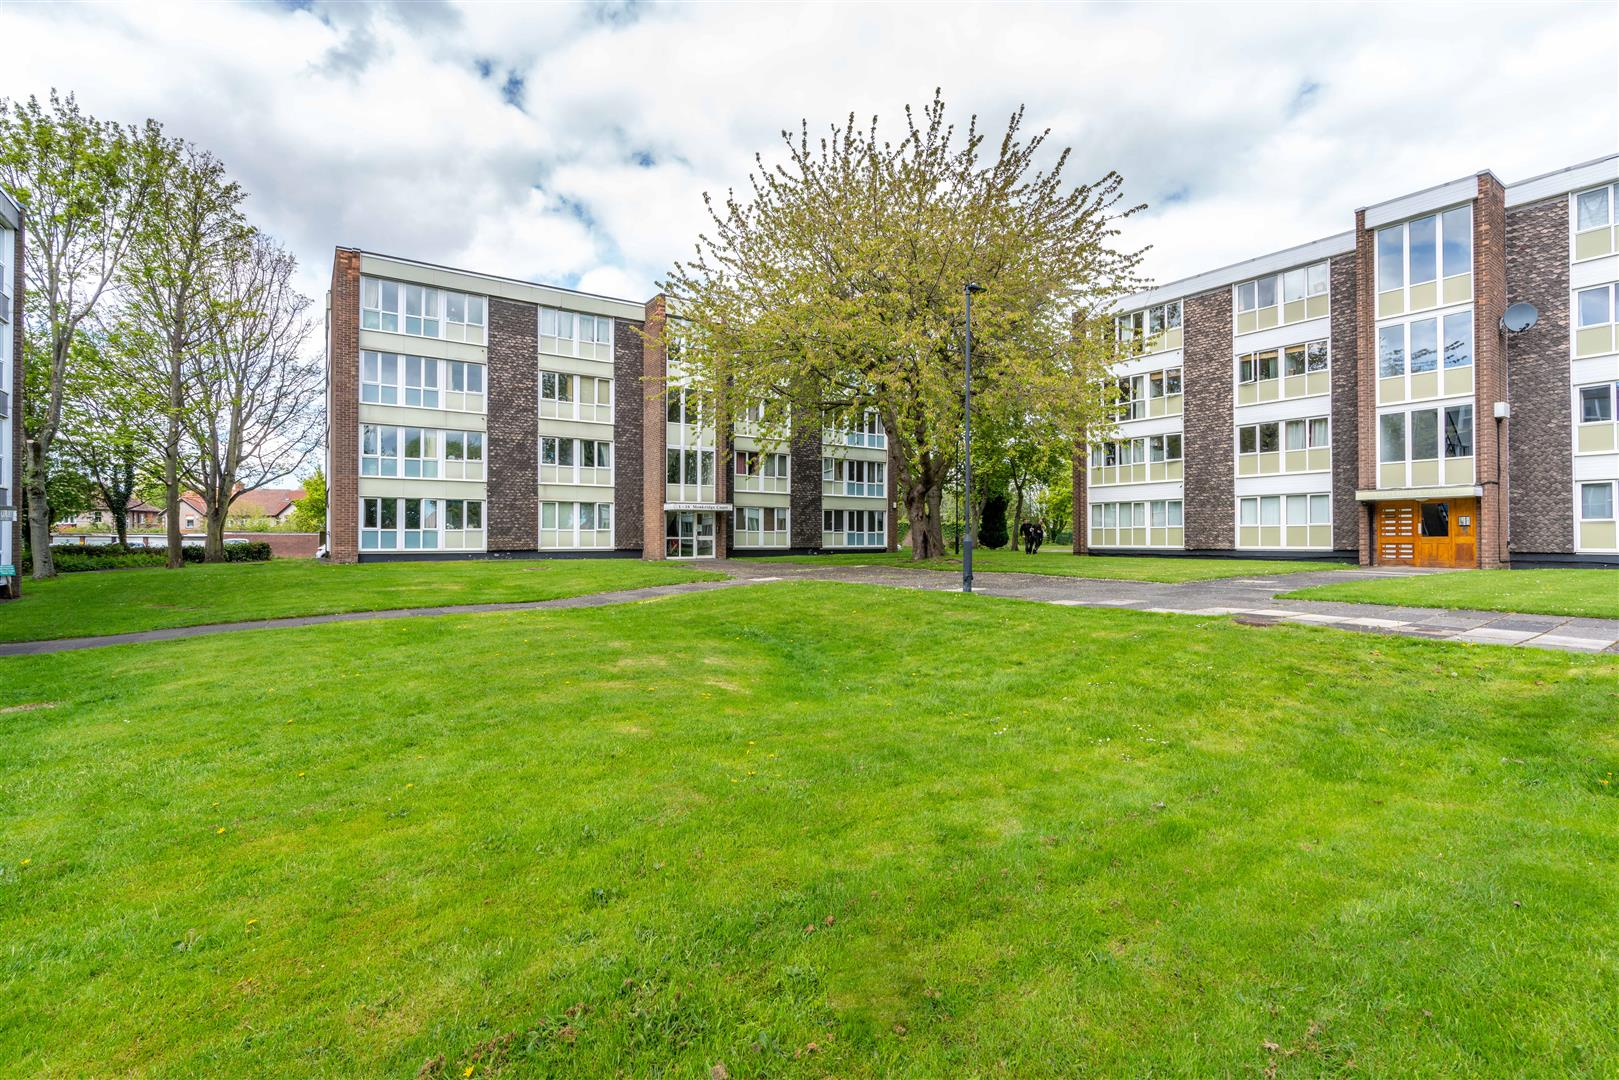 2 bed flat for sale in Monkridge Court, South Gosforth, NE3